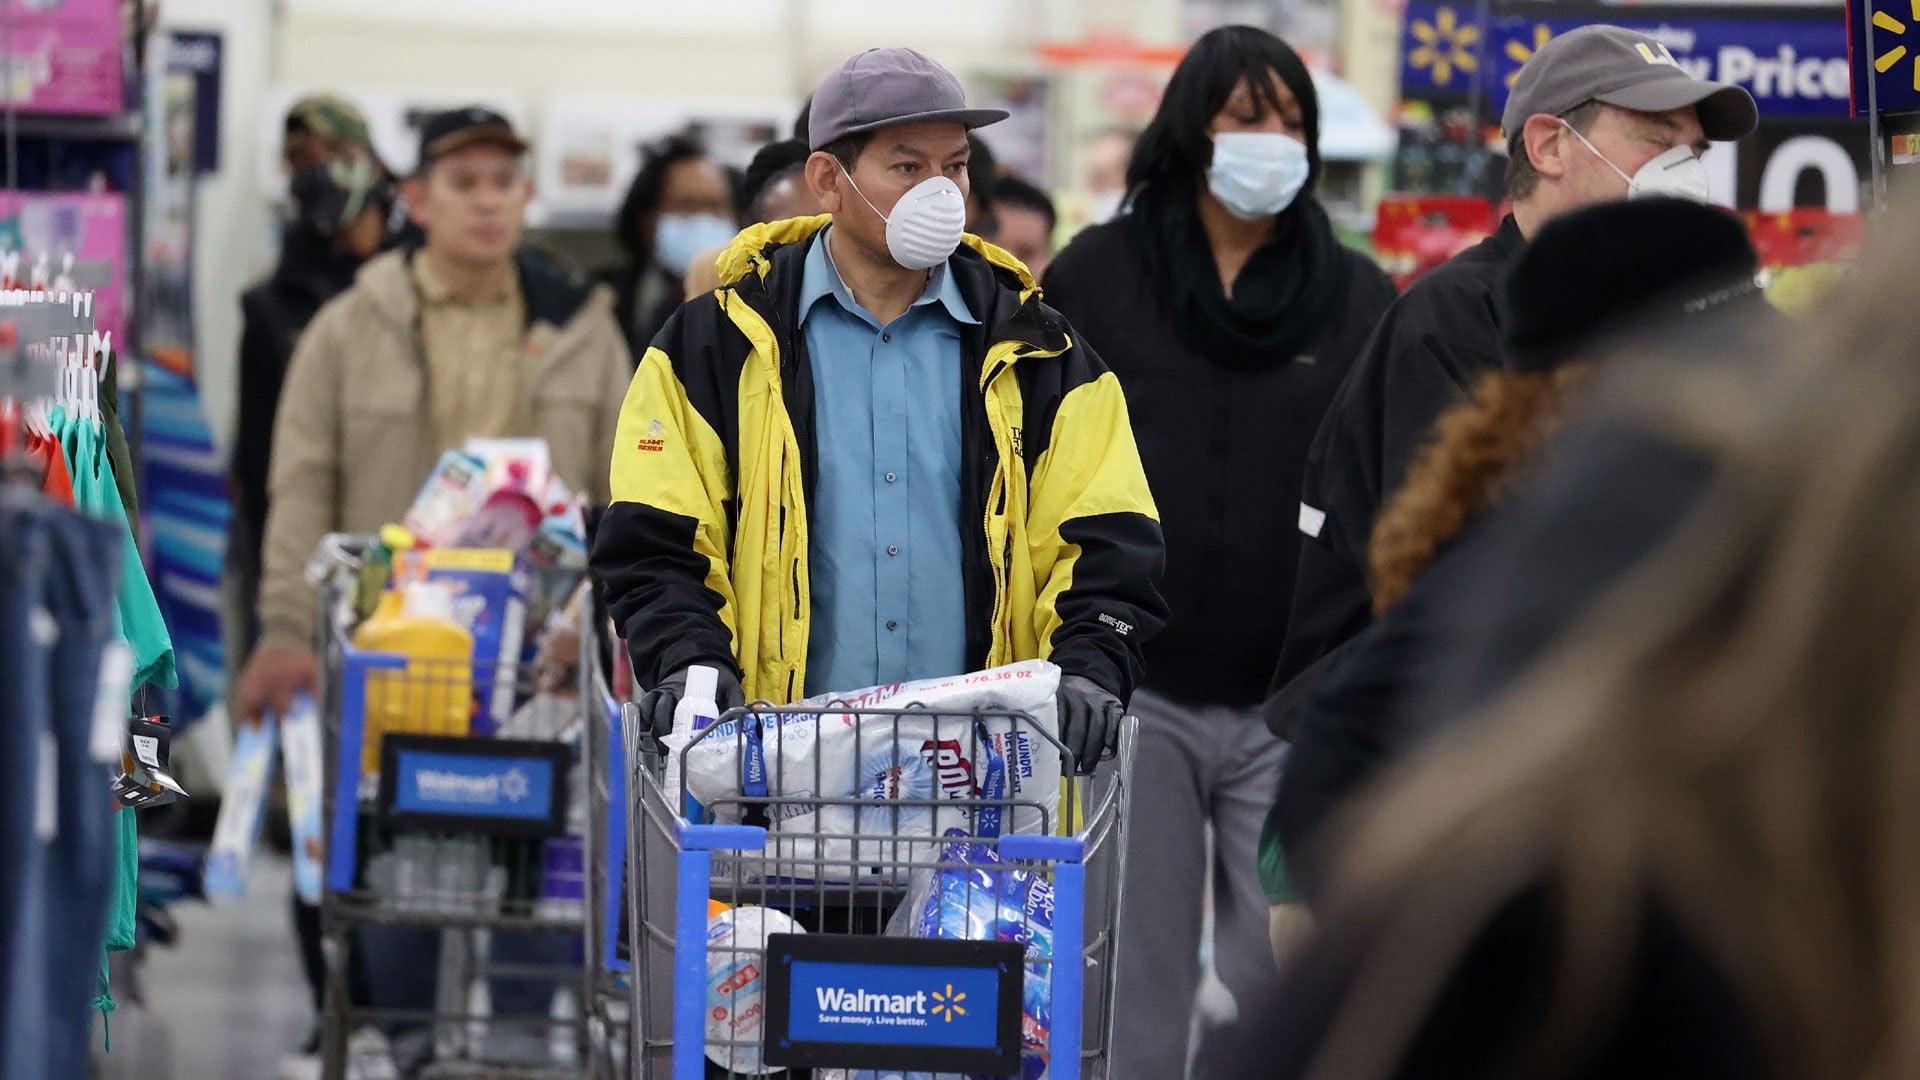 Walmart, Kroger Test One-Way Aisles as Coronavirus Preventative Measure 1